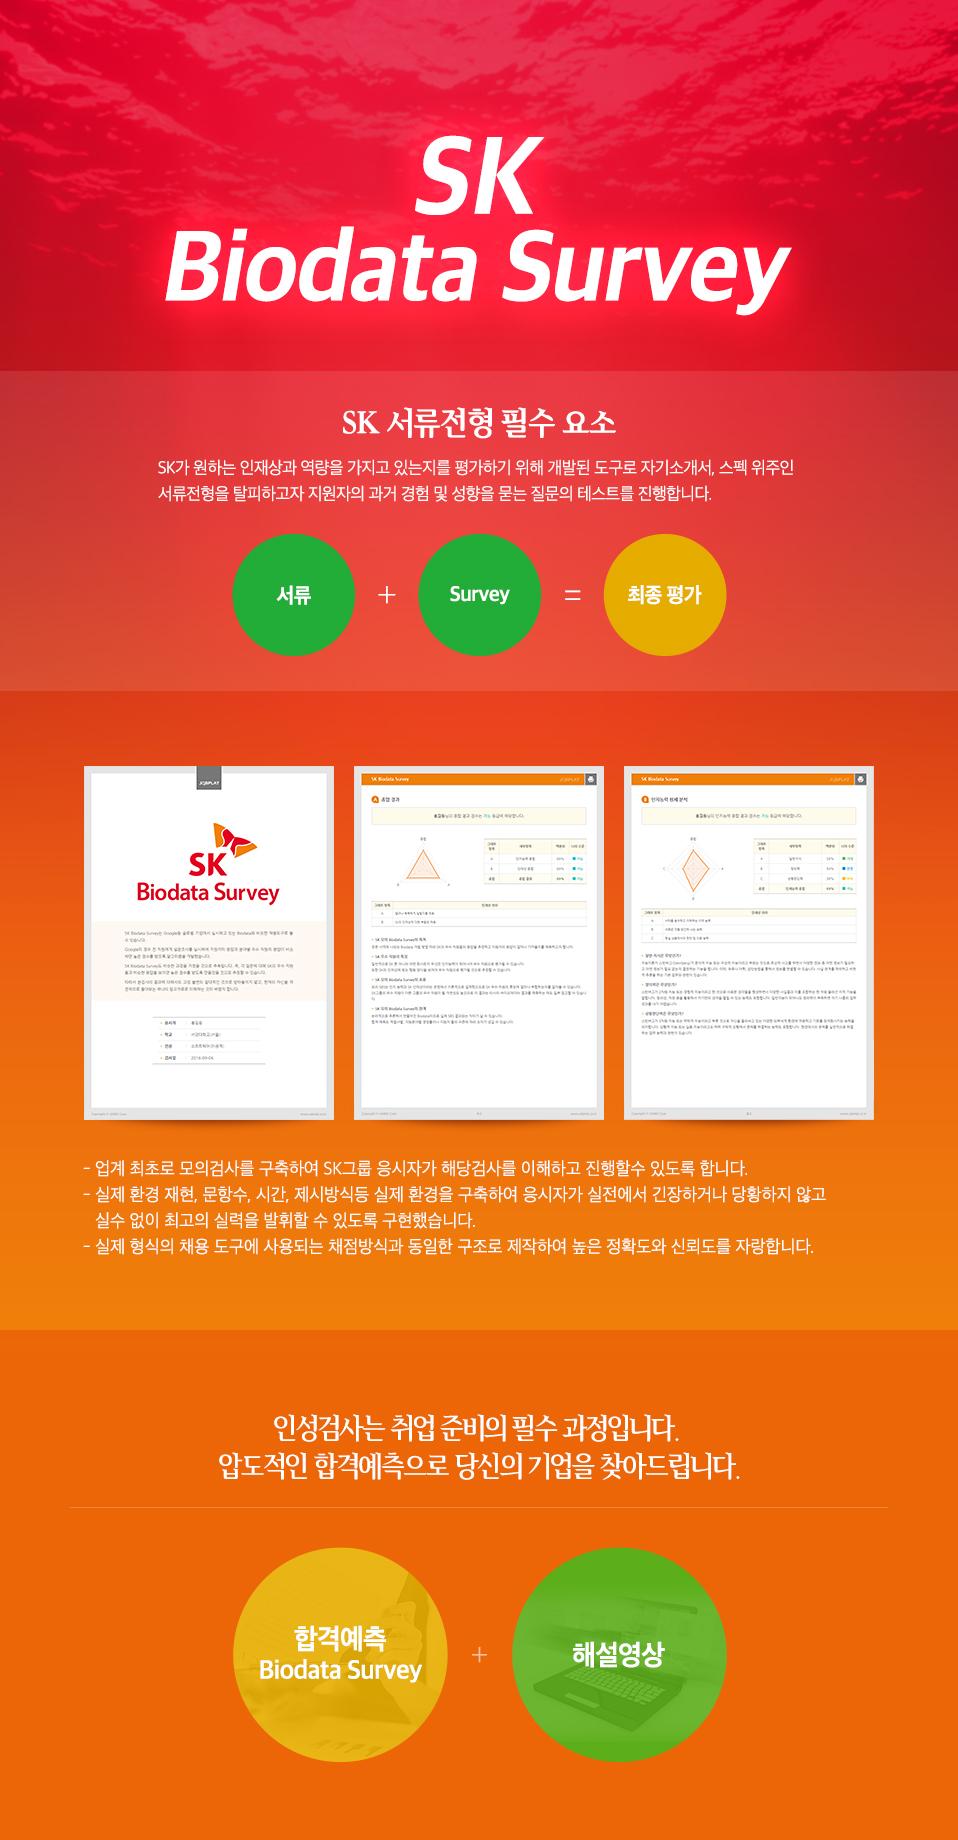 SK Biodata Survey(해설강의포함)